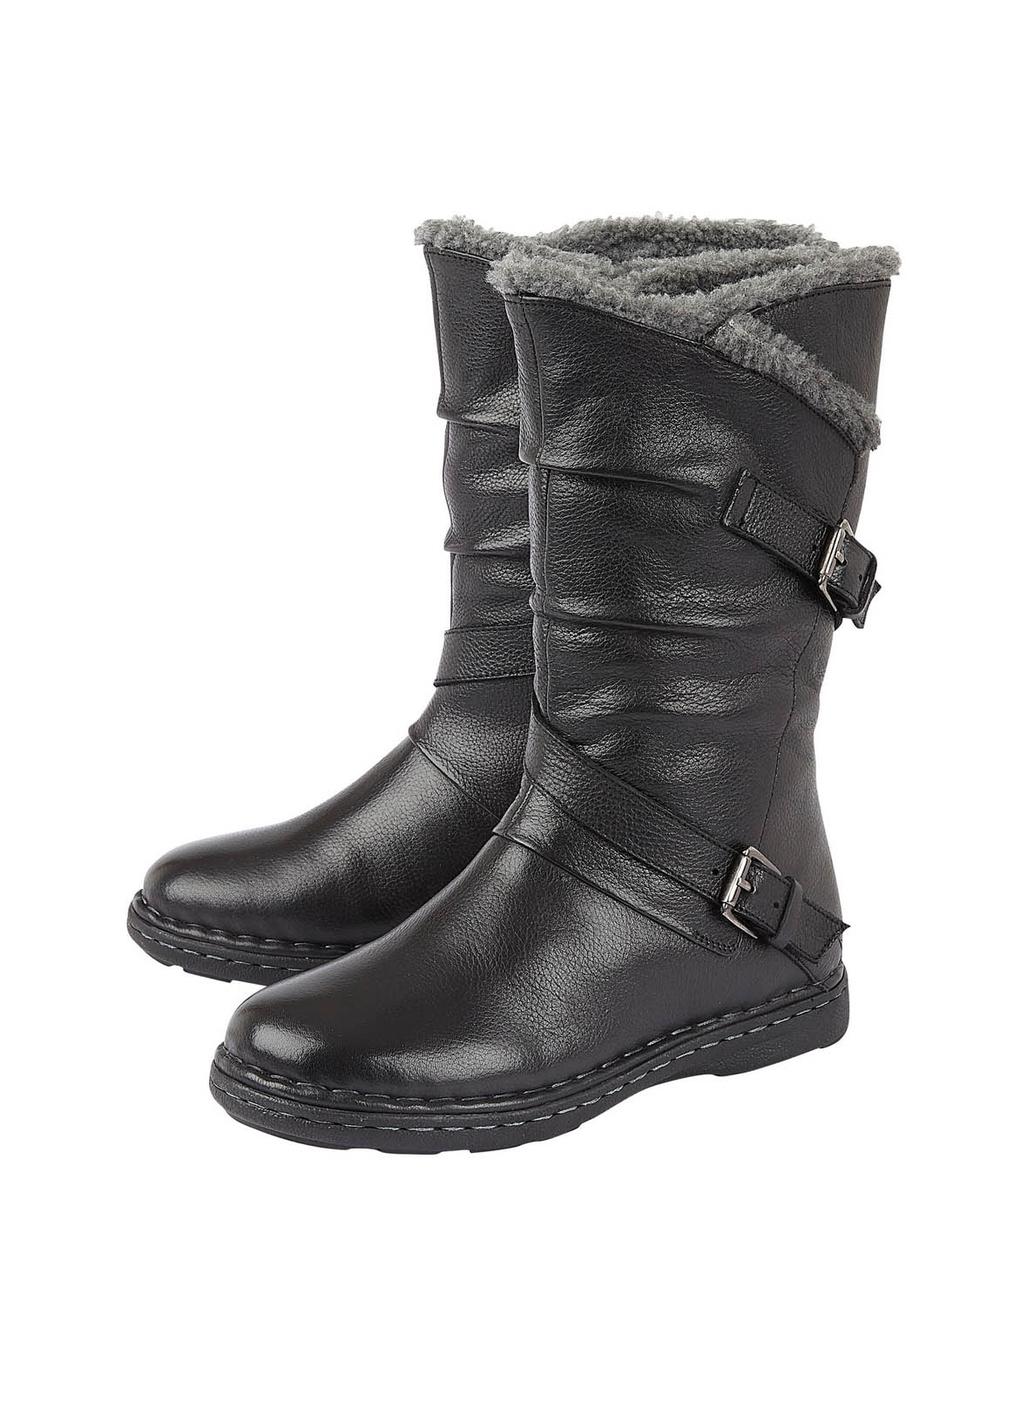 Lotus Jolanda Mid-Calf Leather Boots in Black